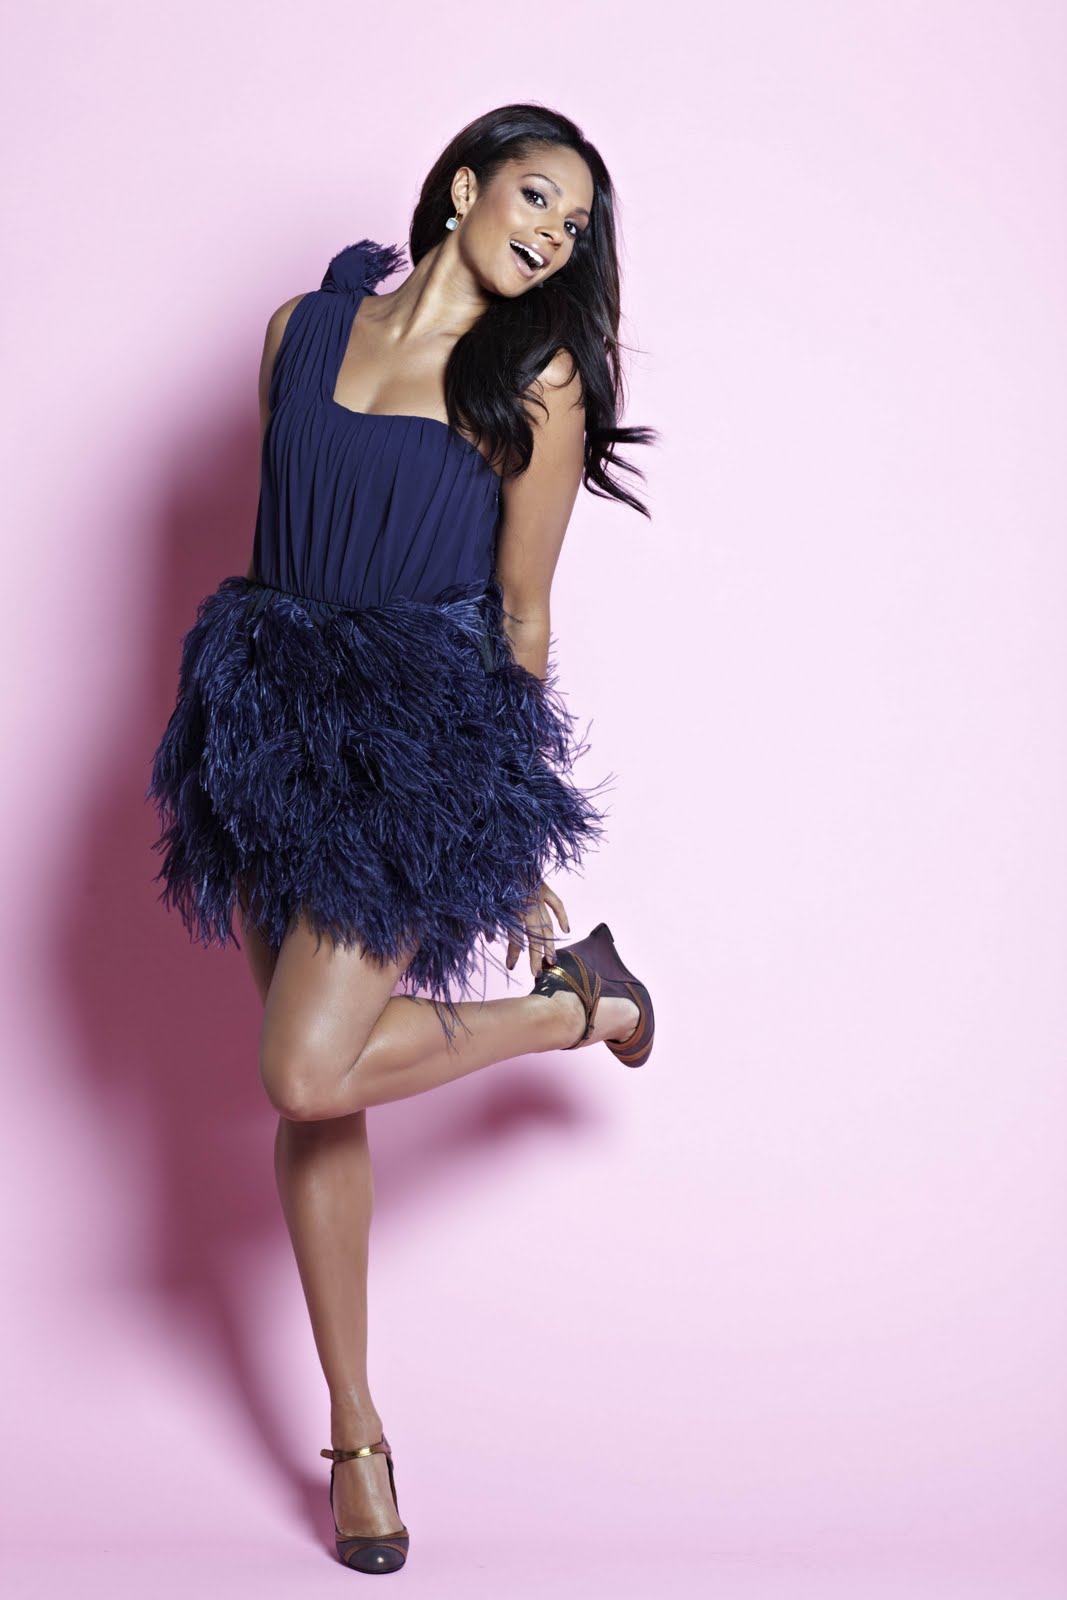 http://4.bp.blogspot.com/-HUzKrgca9n8/TnHonljACVI/AAAAAAAABMs/kMLe8mAJ0_k/s1600/Alesha+Dixon+beautiful+business+model+%252845%2529.jpg